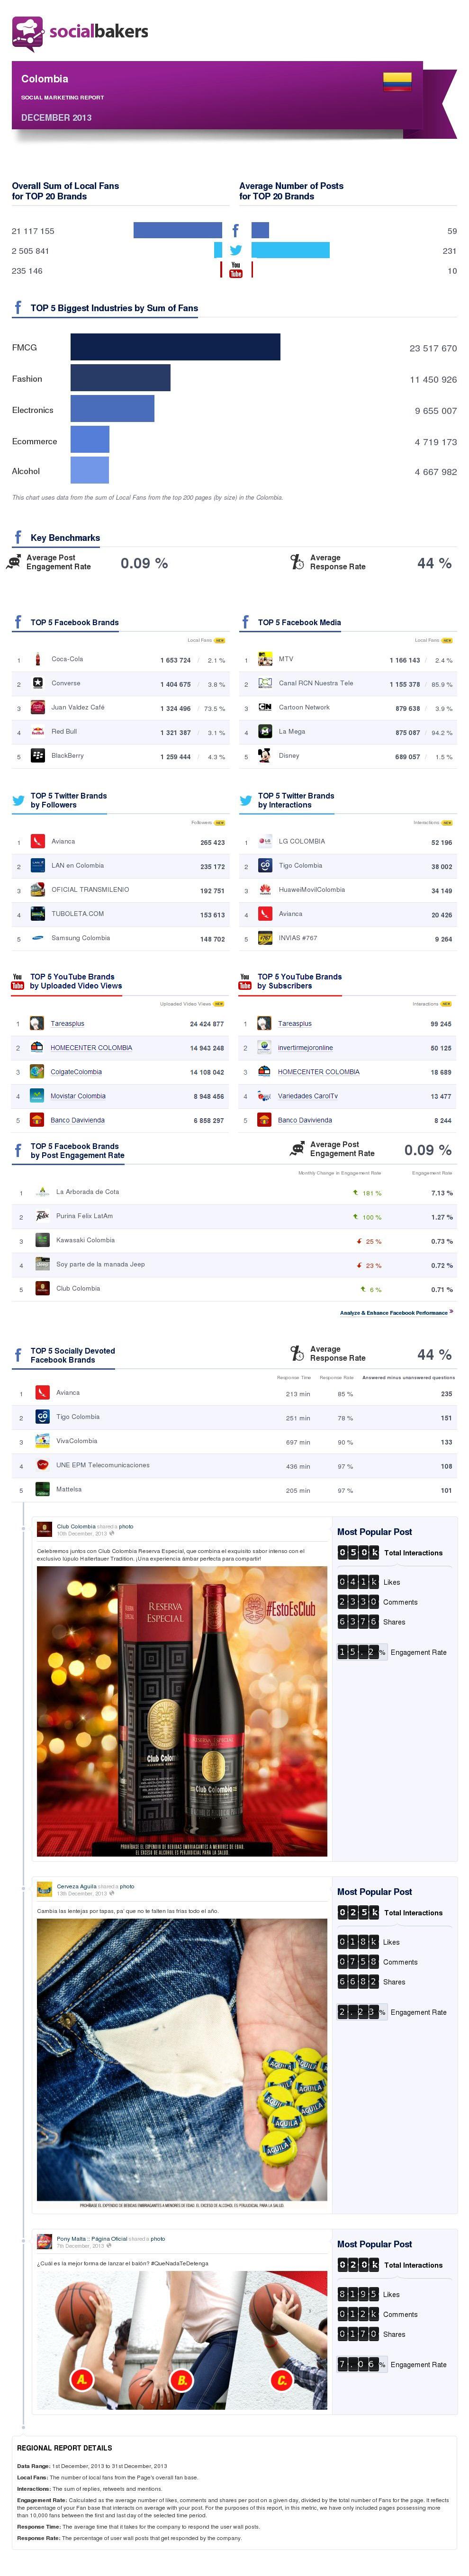 december-2013-social-marketing-report-colombia-regional-thumbnail